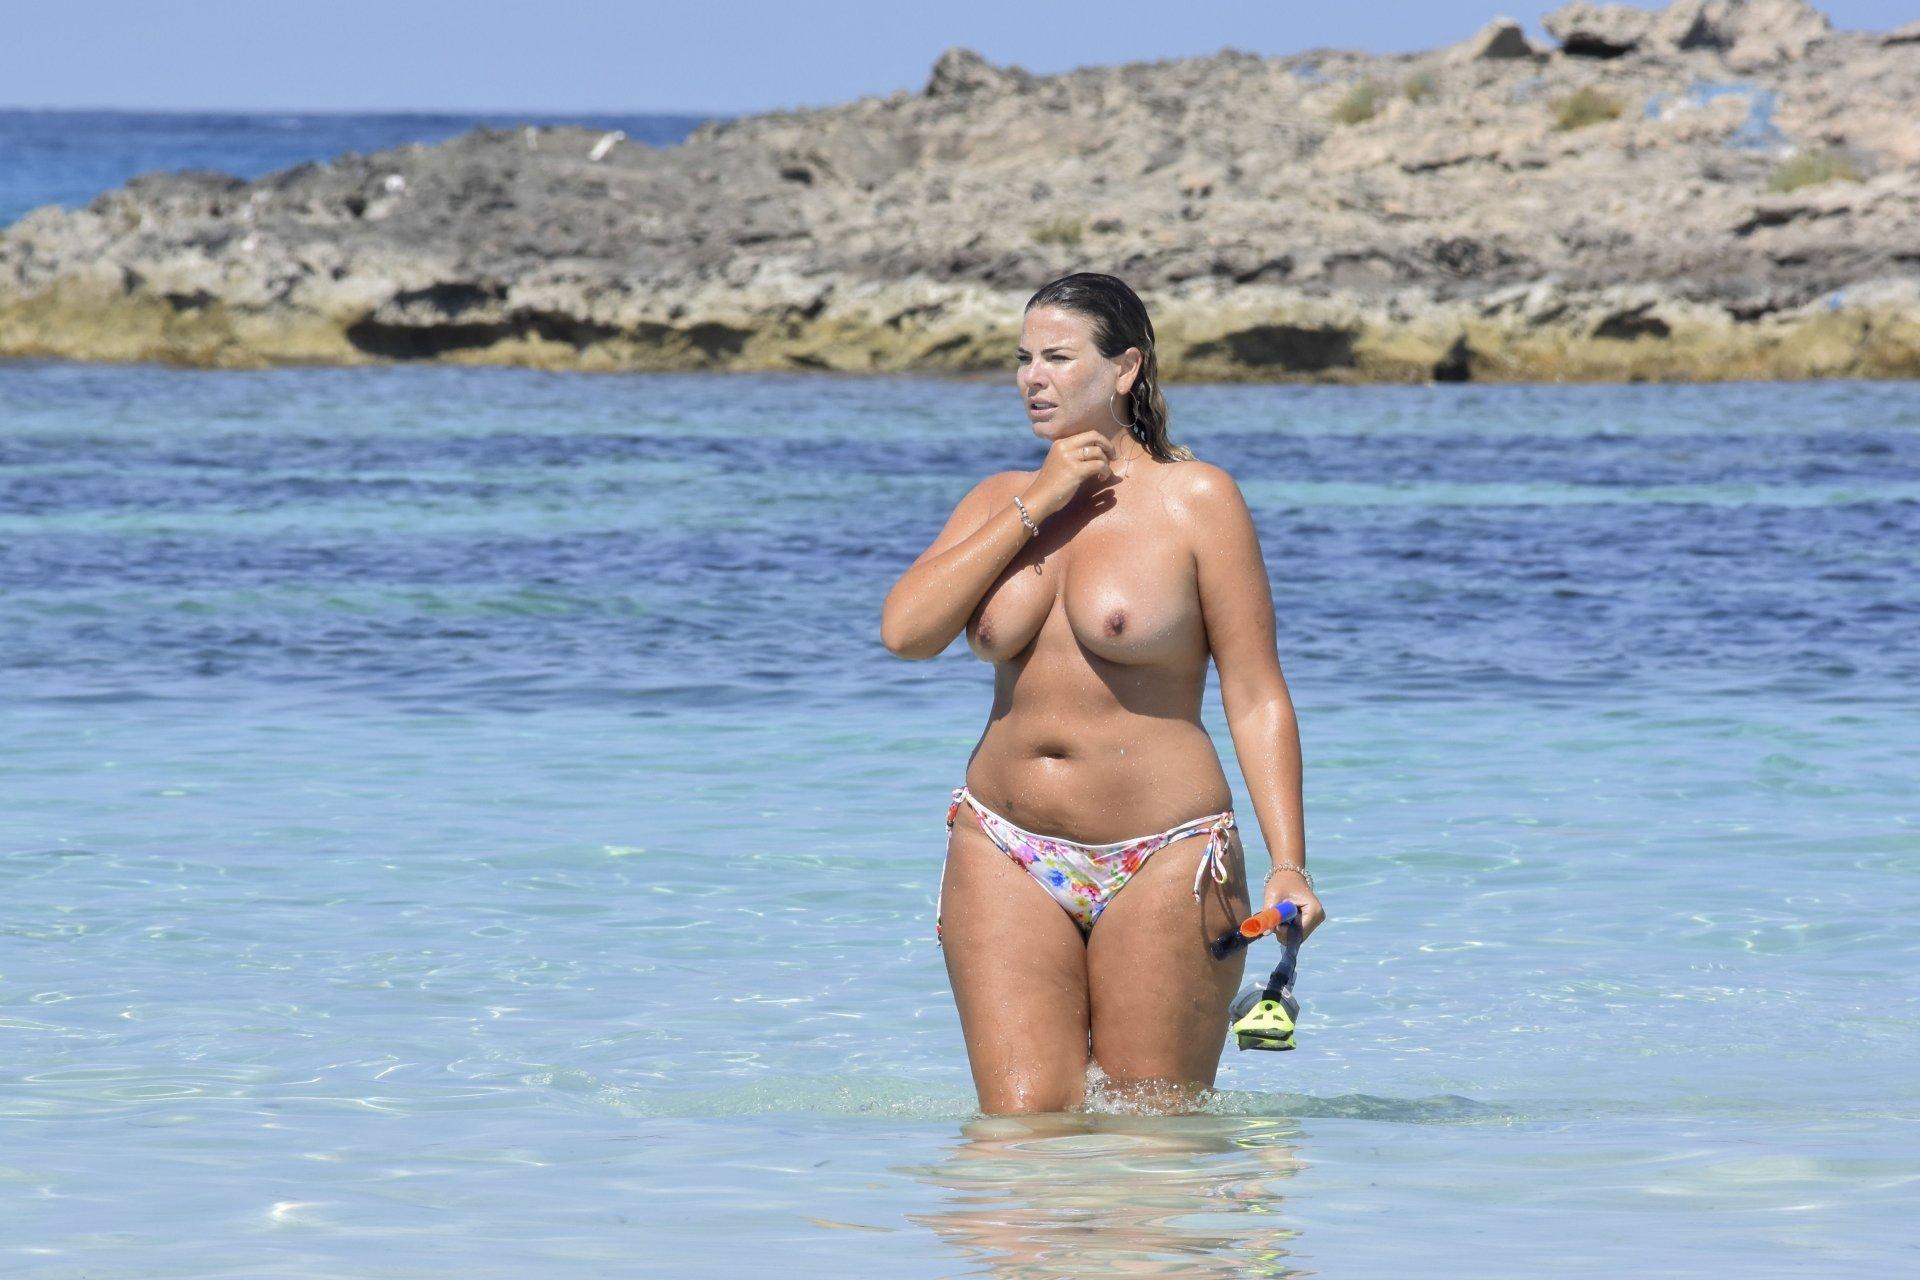 Fiona-Falkiner-Topless-TheFappeningBlog.com-5.jpg